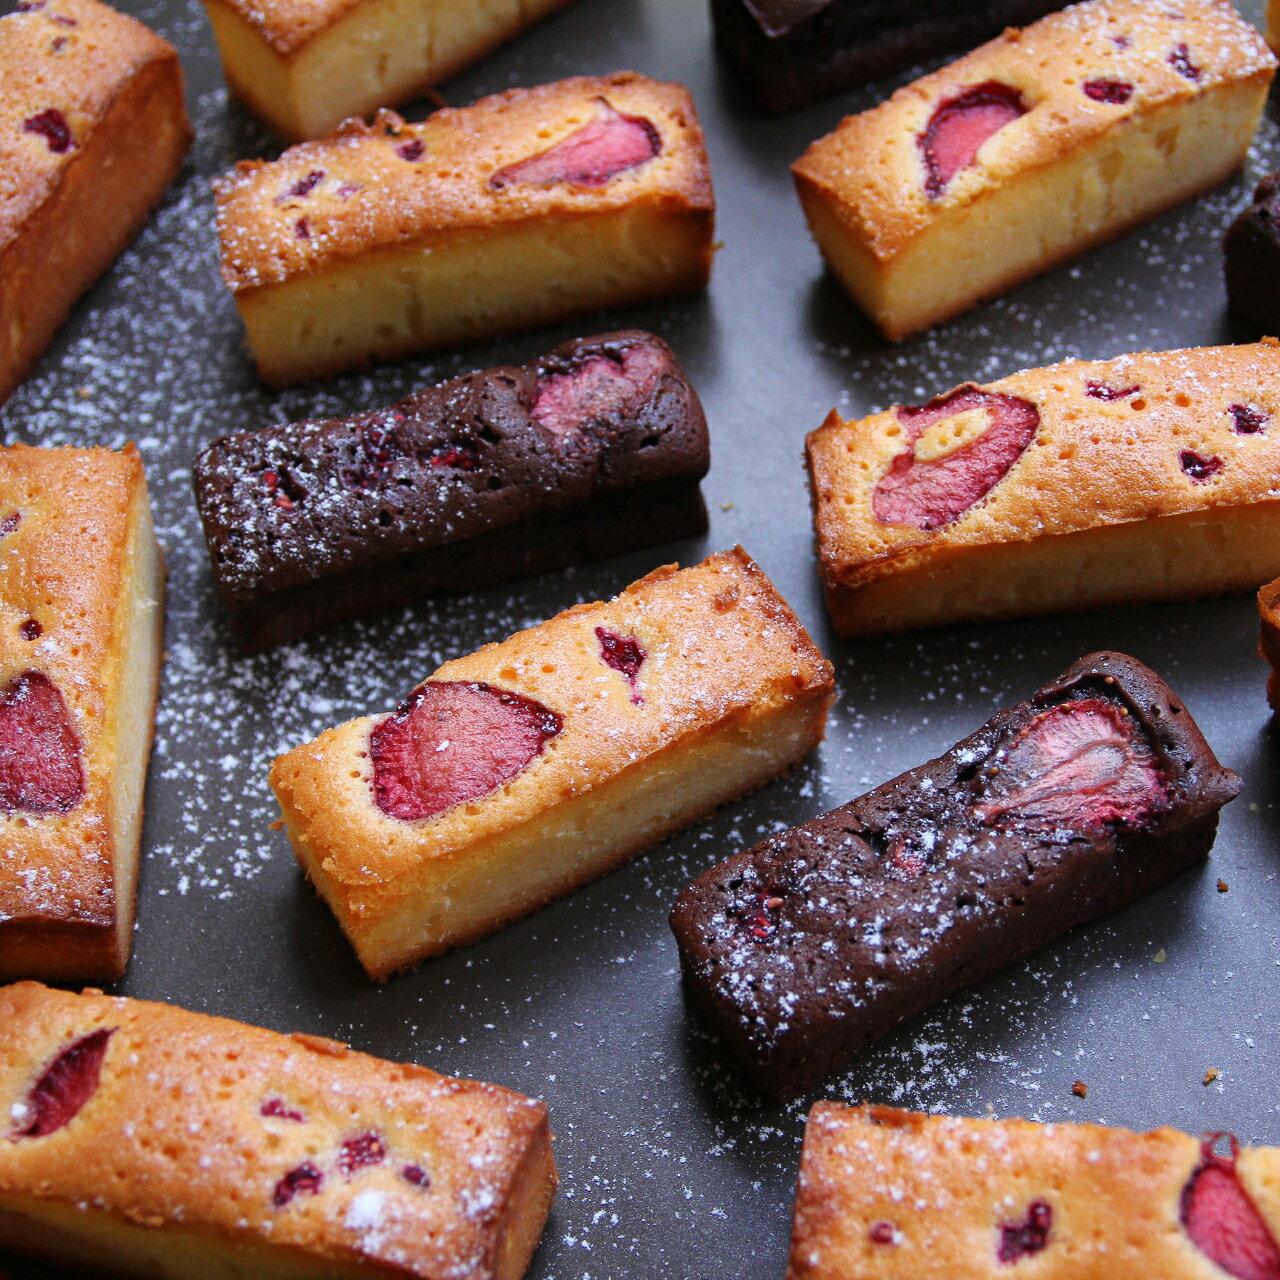 Cocolicious口口好吃 蜂蜜草莓/巧克力草莓磅蛋糕禮盒 8入